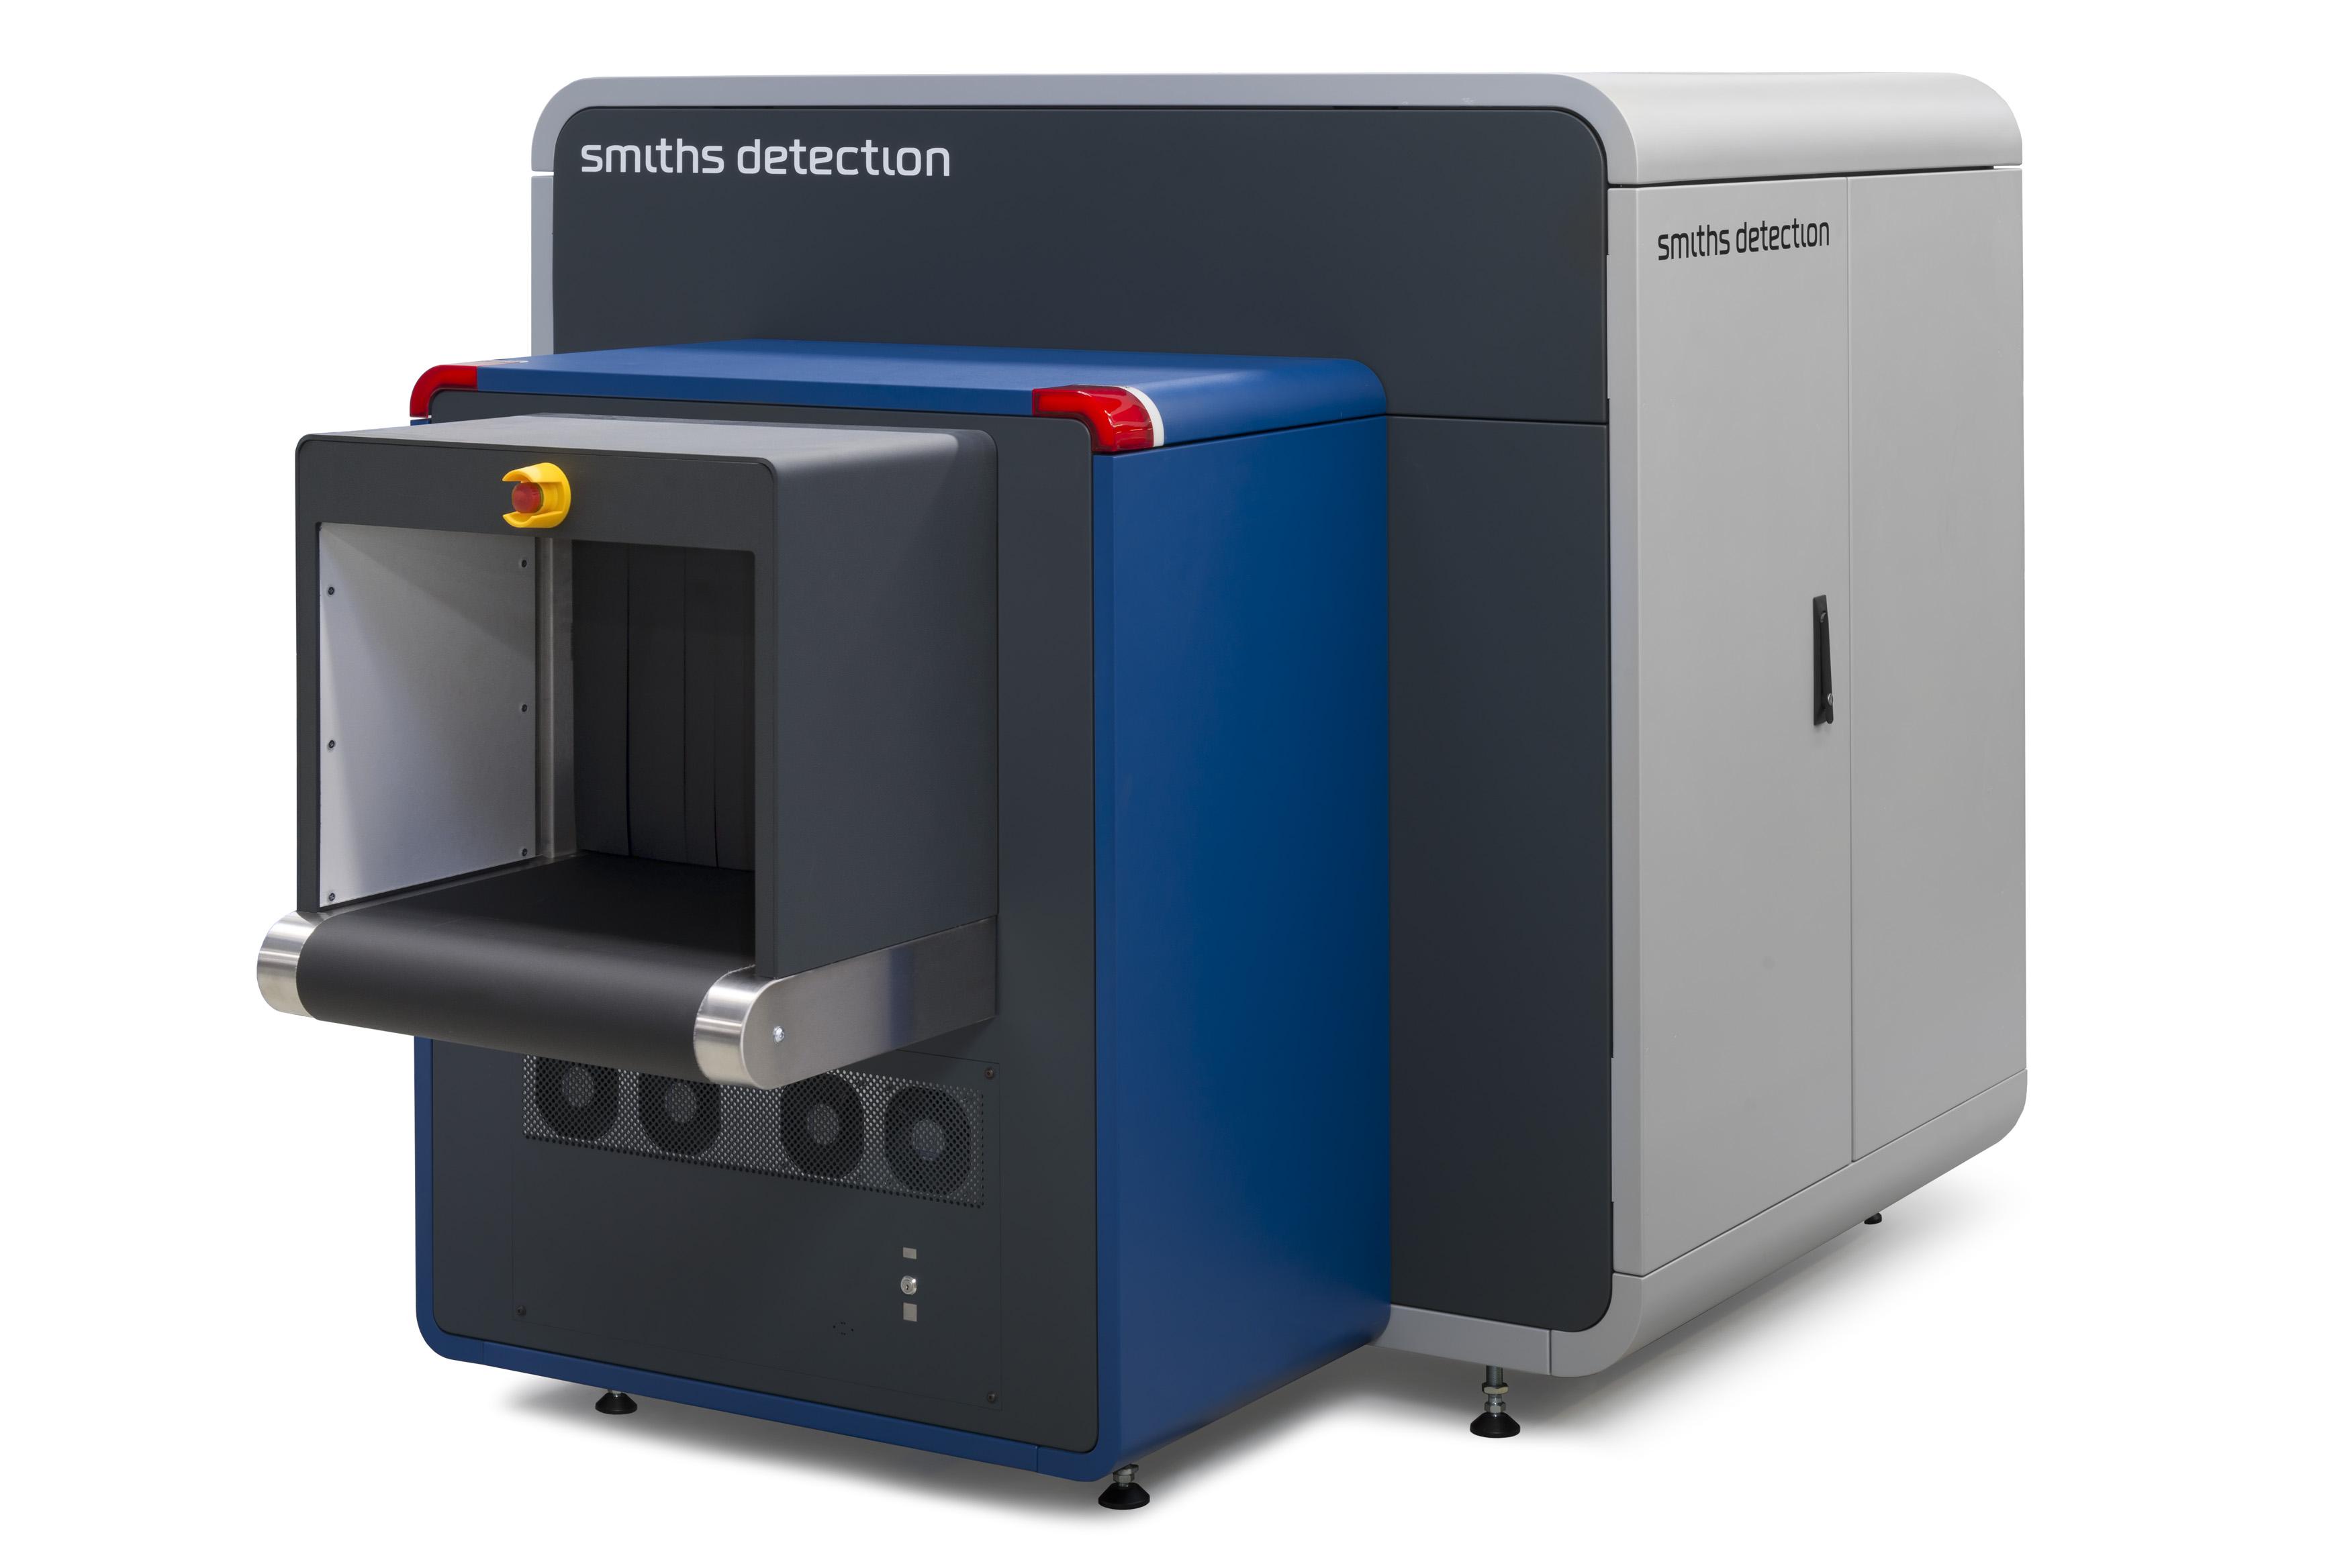 Smiths Detection Receives Tsa Certification For Hi Scan 6040 Ctix